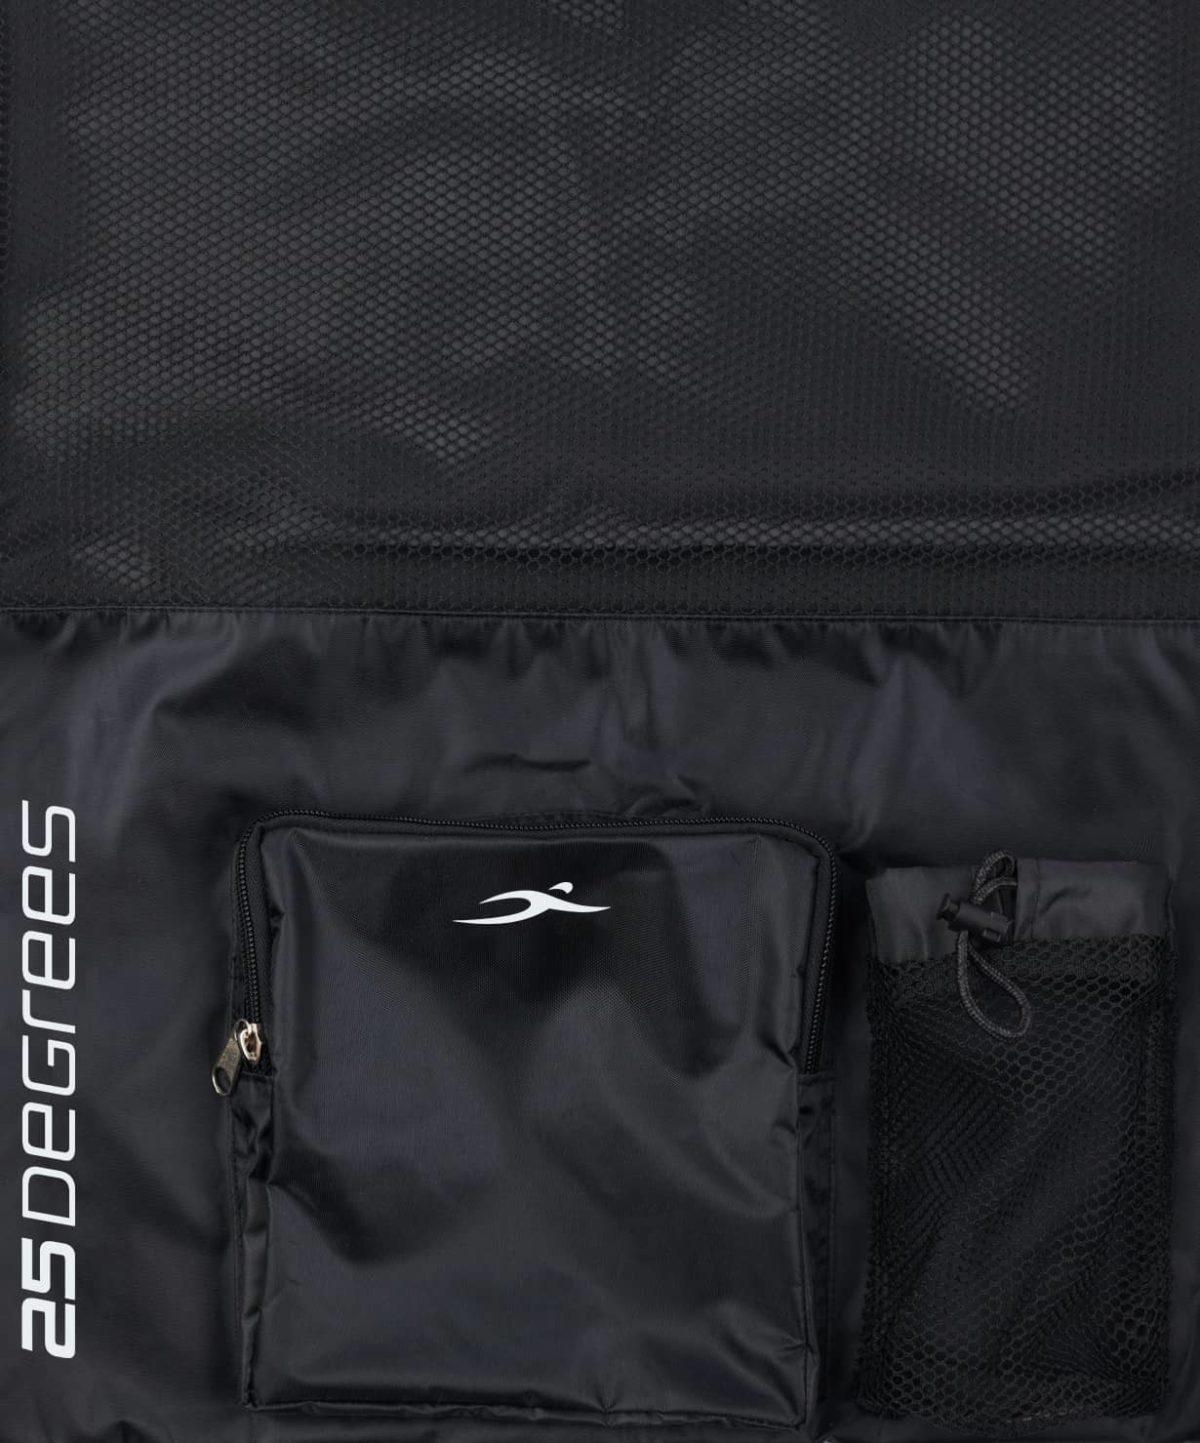 25DEGREES Рюкзак Maxpack  25D21015: чёрный - 3